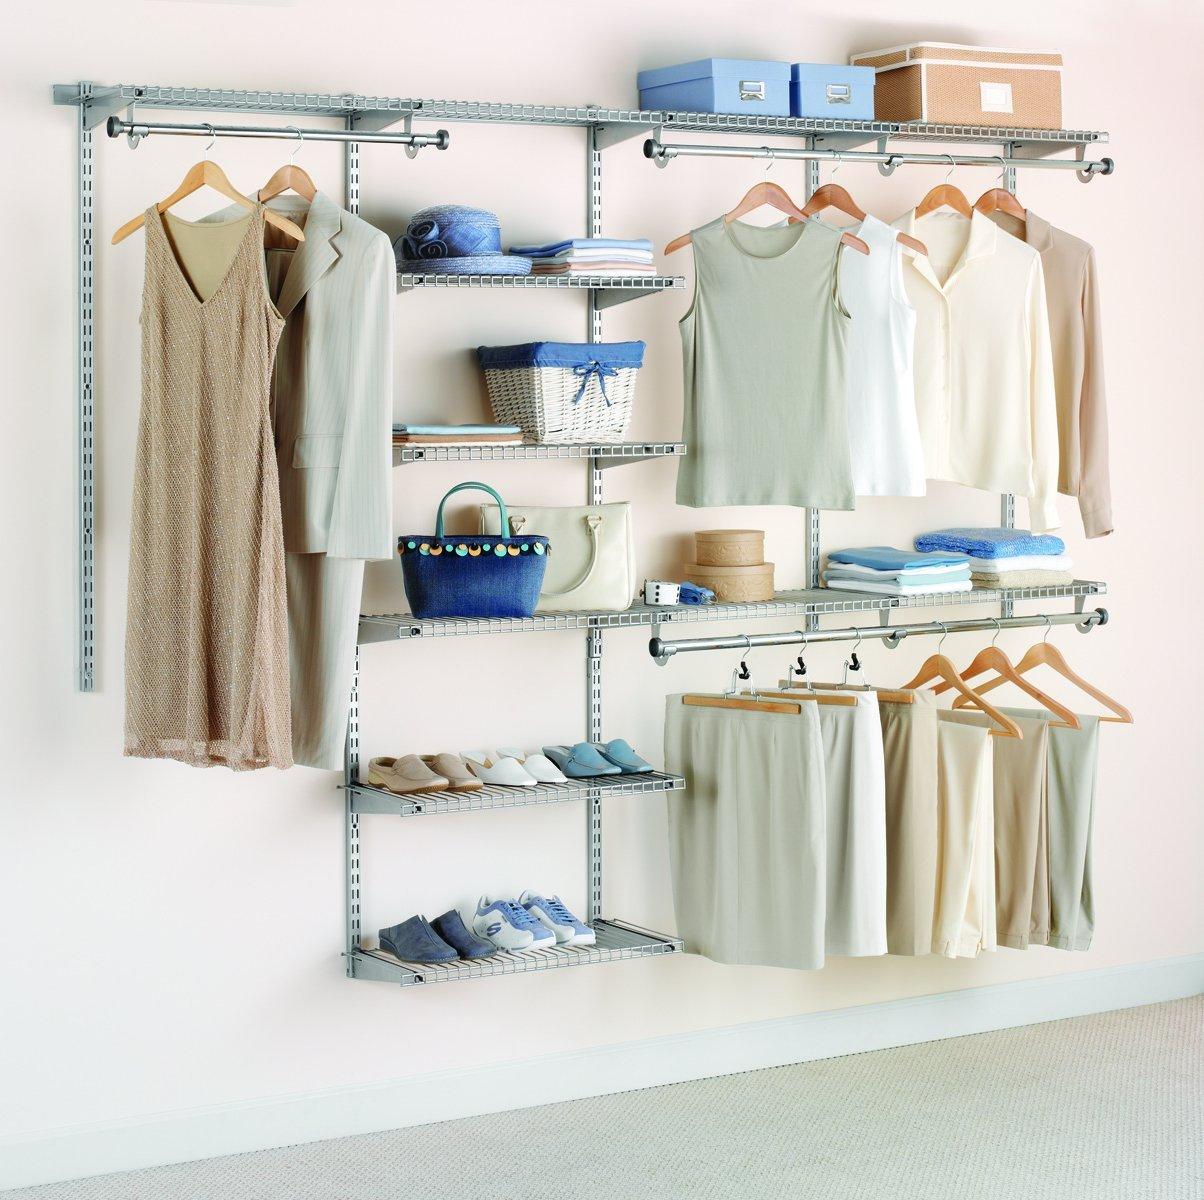 Rubbermaid Closet Organizer - Lowest Price Ever ($75.99)